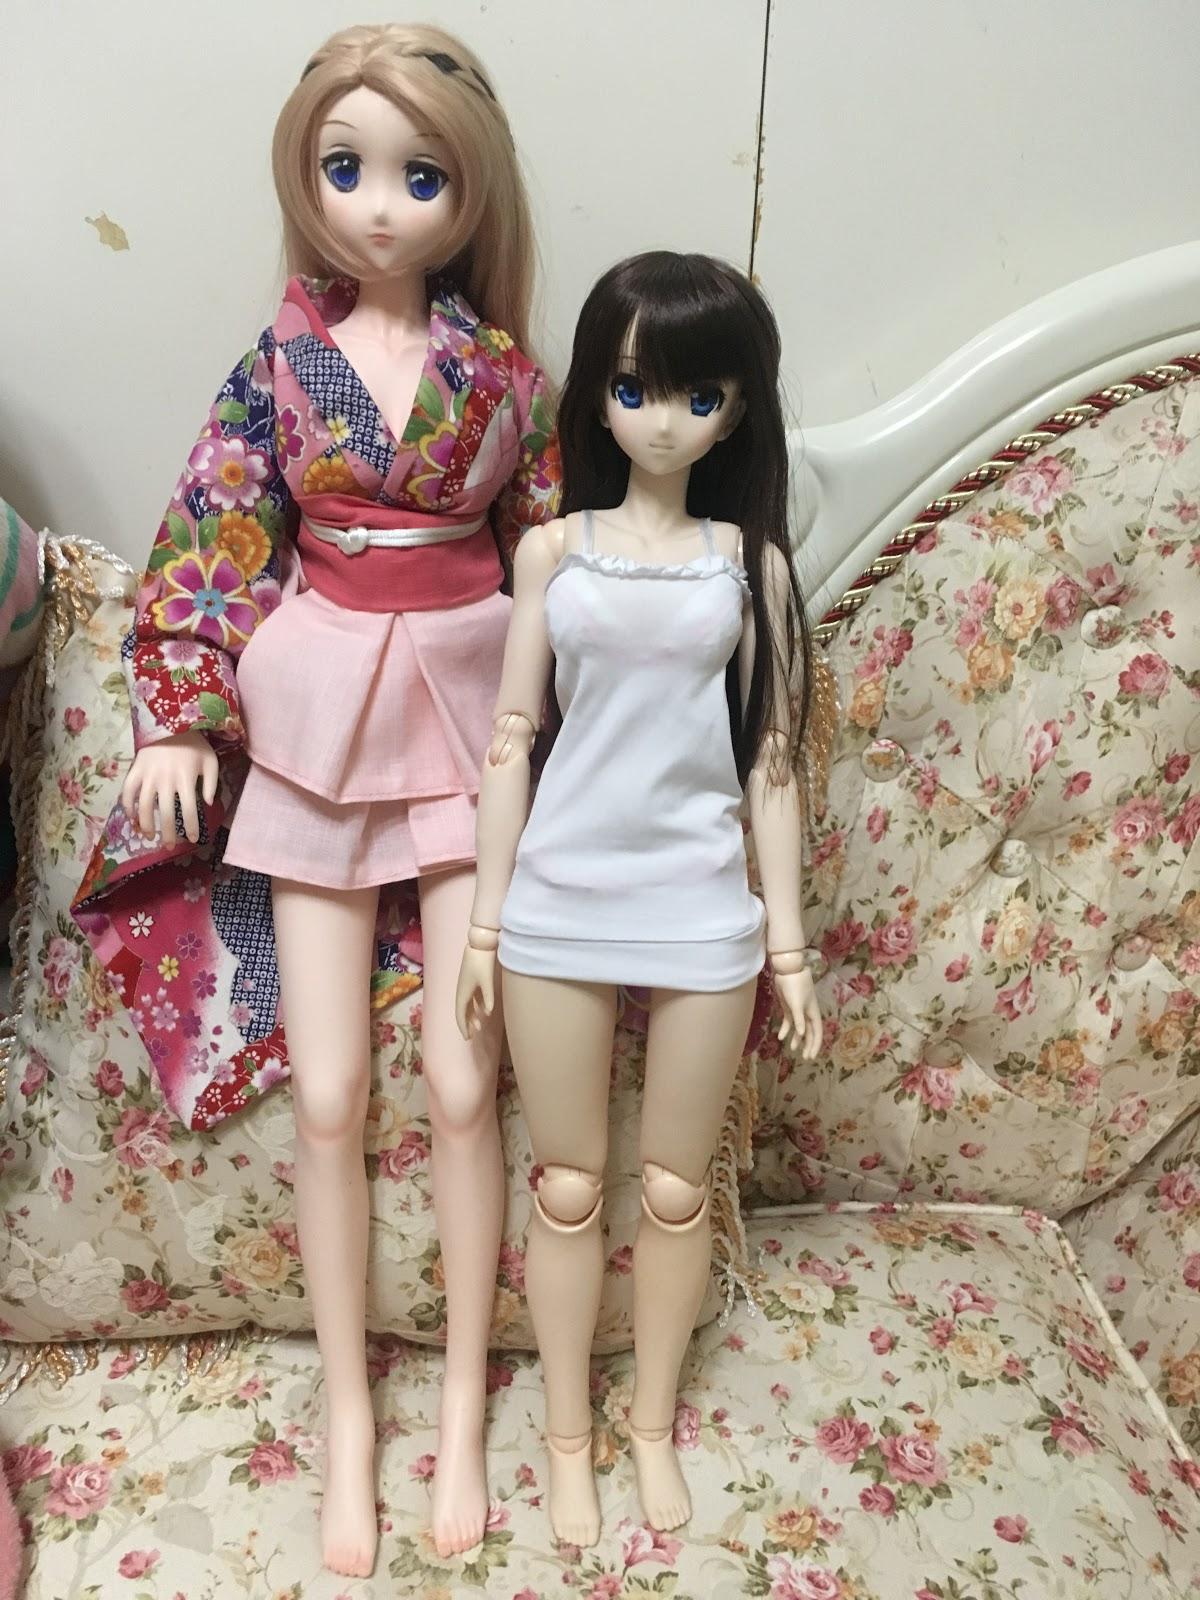 1/3大型娃娃分享-Evoke doll 62cm(類似volks dd&mdd)